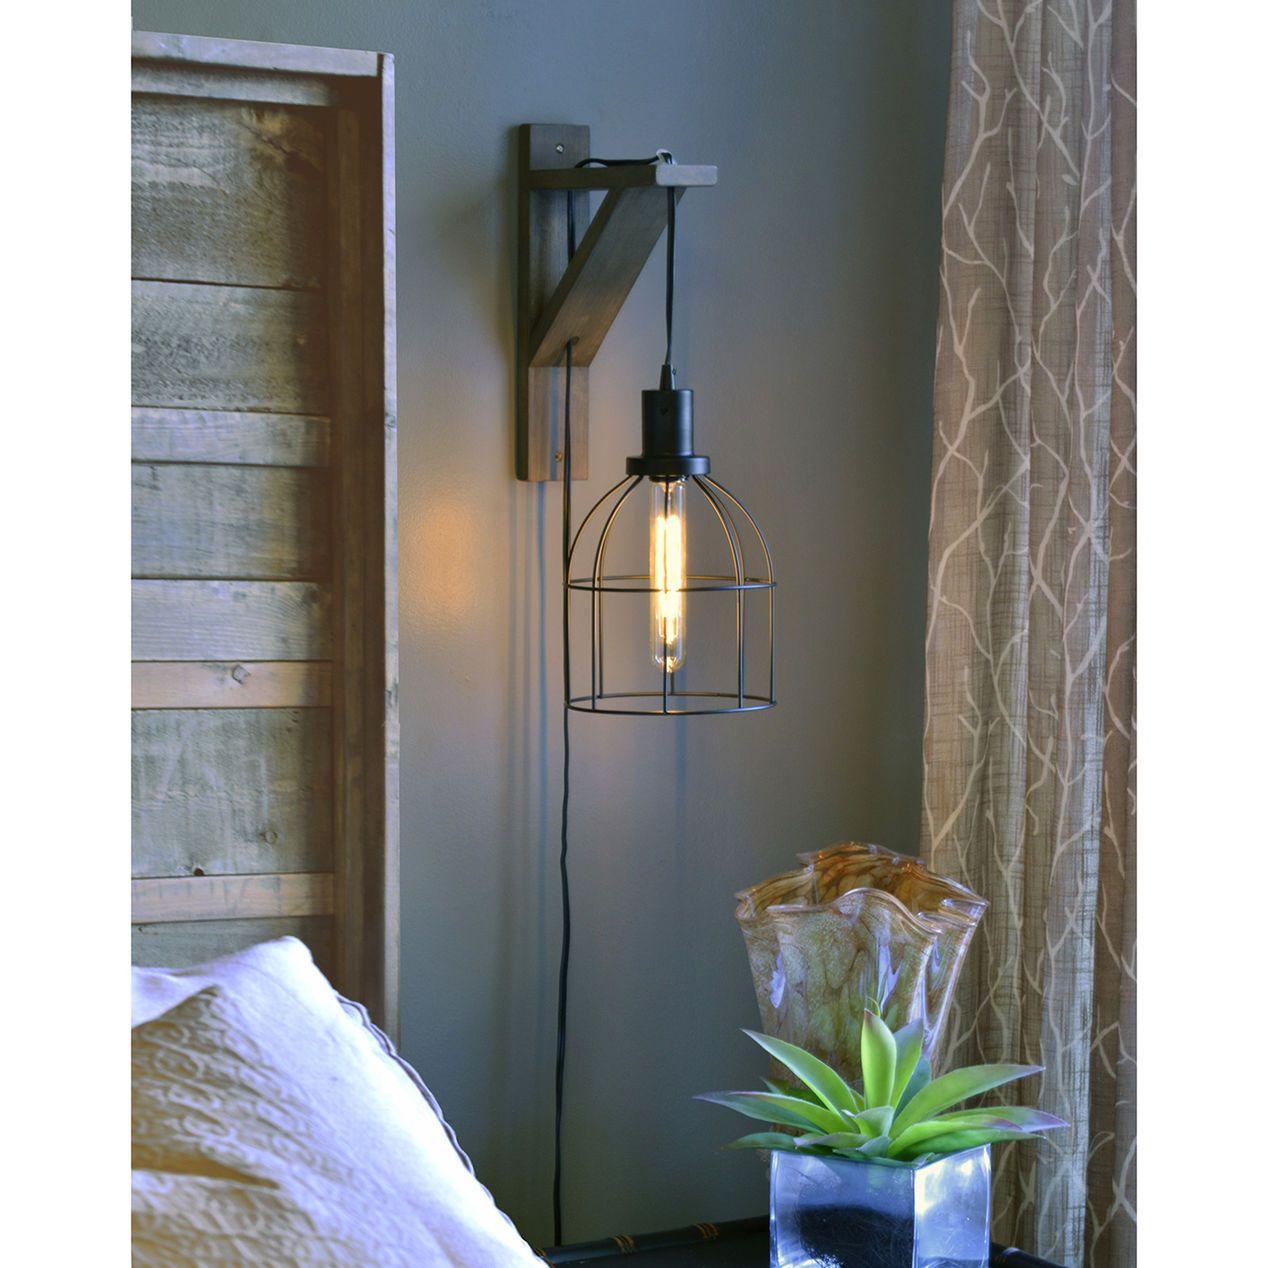 Black Metal Pendant Wall Mounted Lights Bedroom Hanging Bedroom Lights Wall Lamps Bedroom